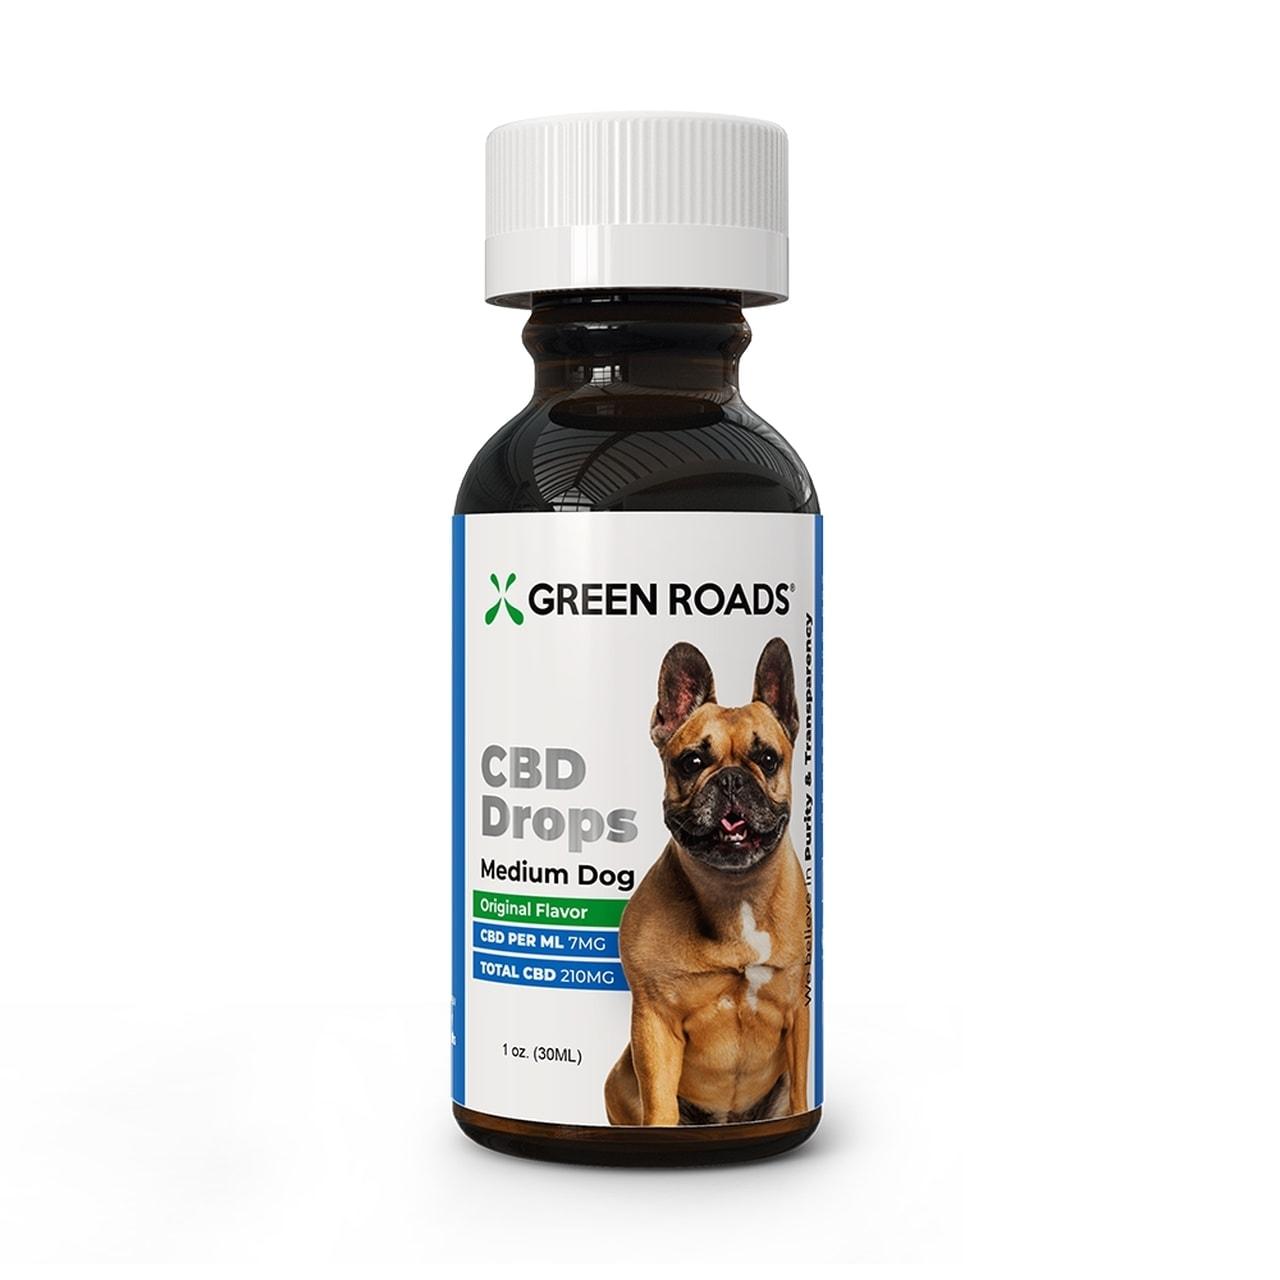 Green Roads, Pet CBD Oil Drops Medium Dog, Broad Spectrum THC-Free, 1oz, 210mg of CBD2